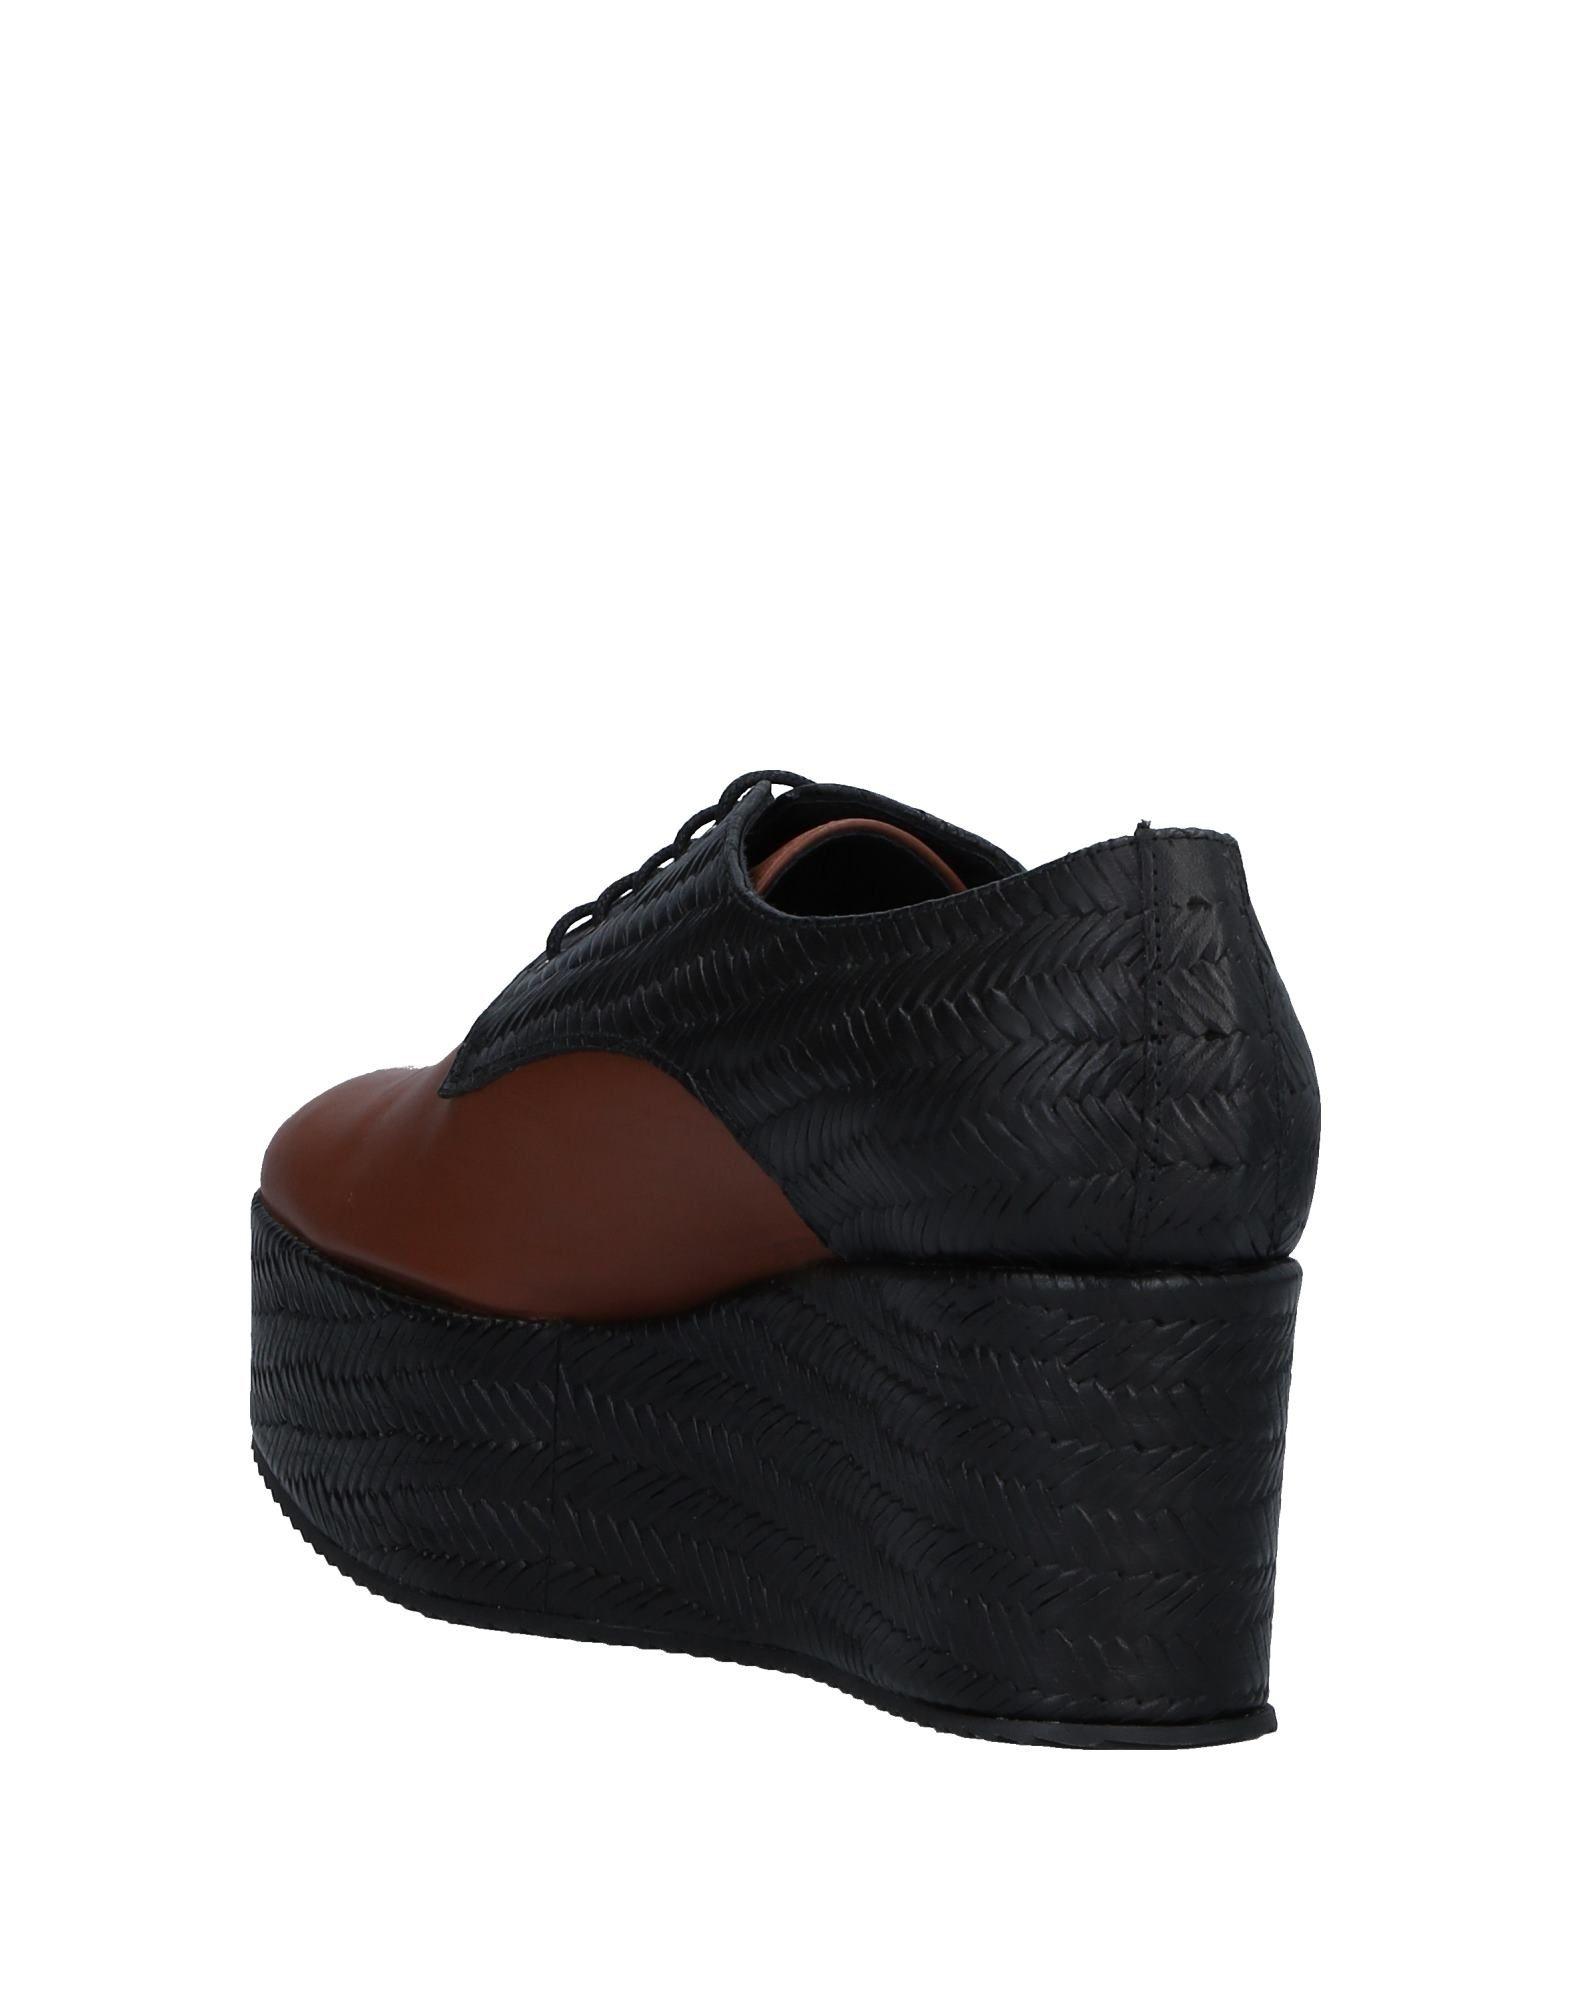 11537061FC Castañer Schnürschuhe Damen  11537061FC  Heiße Schuhe fc4681